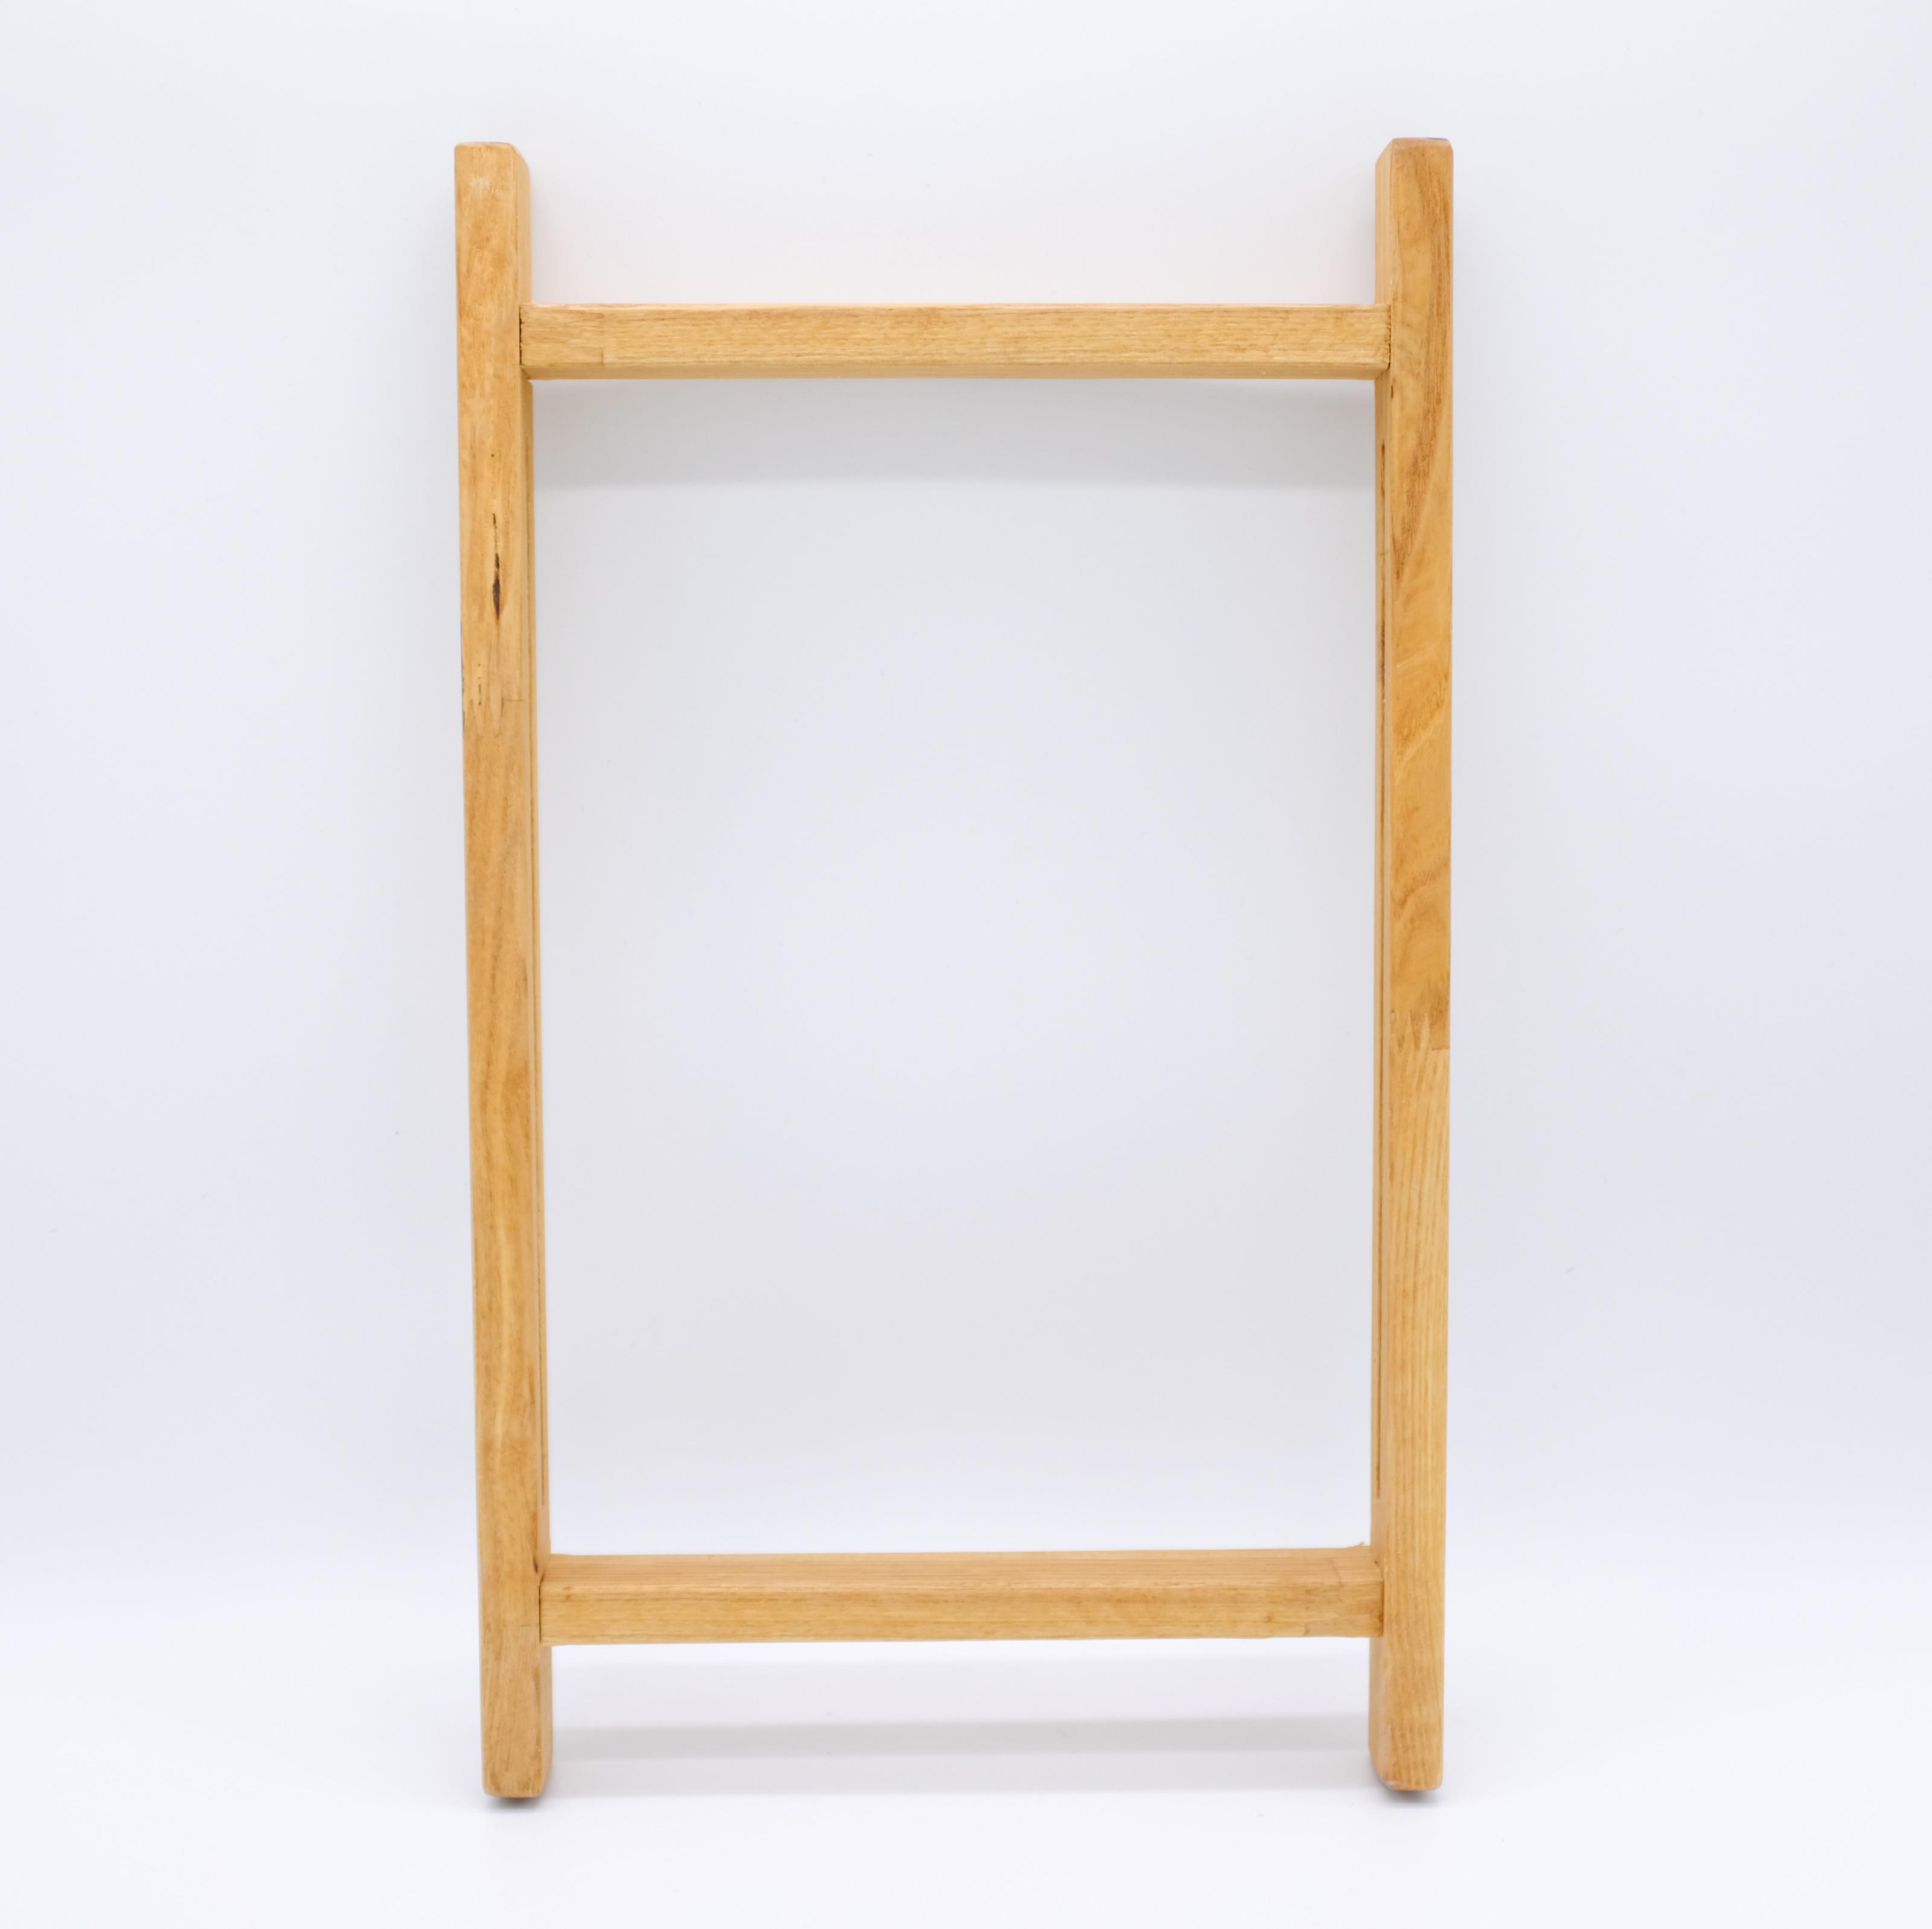 sumika M専用 木枠 ナチュラル